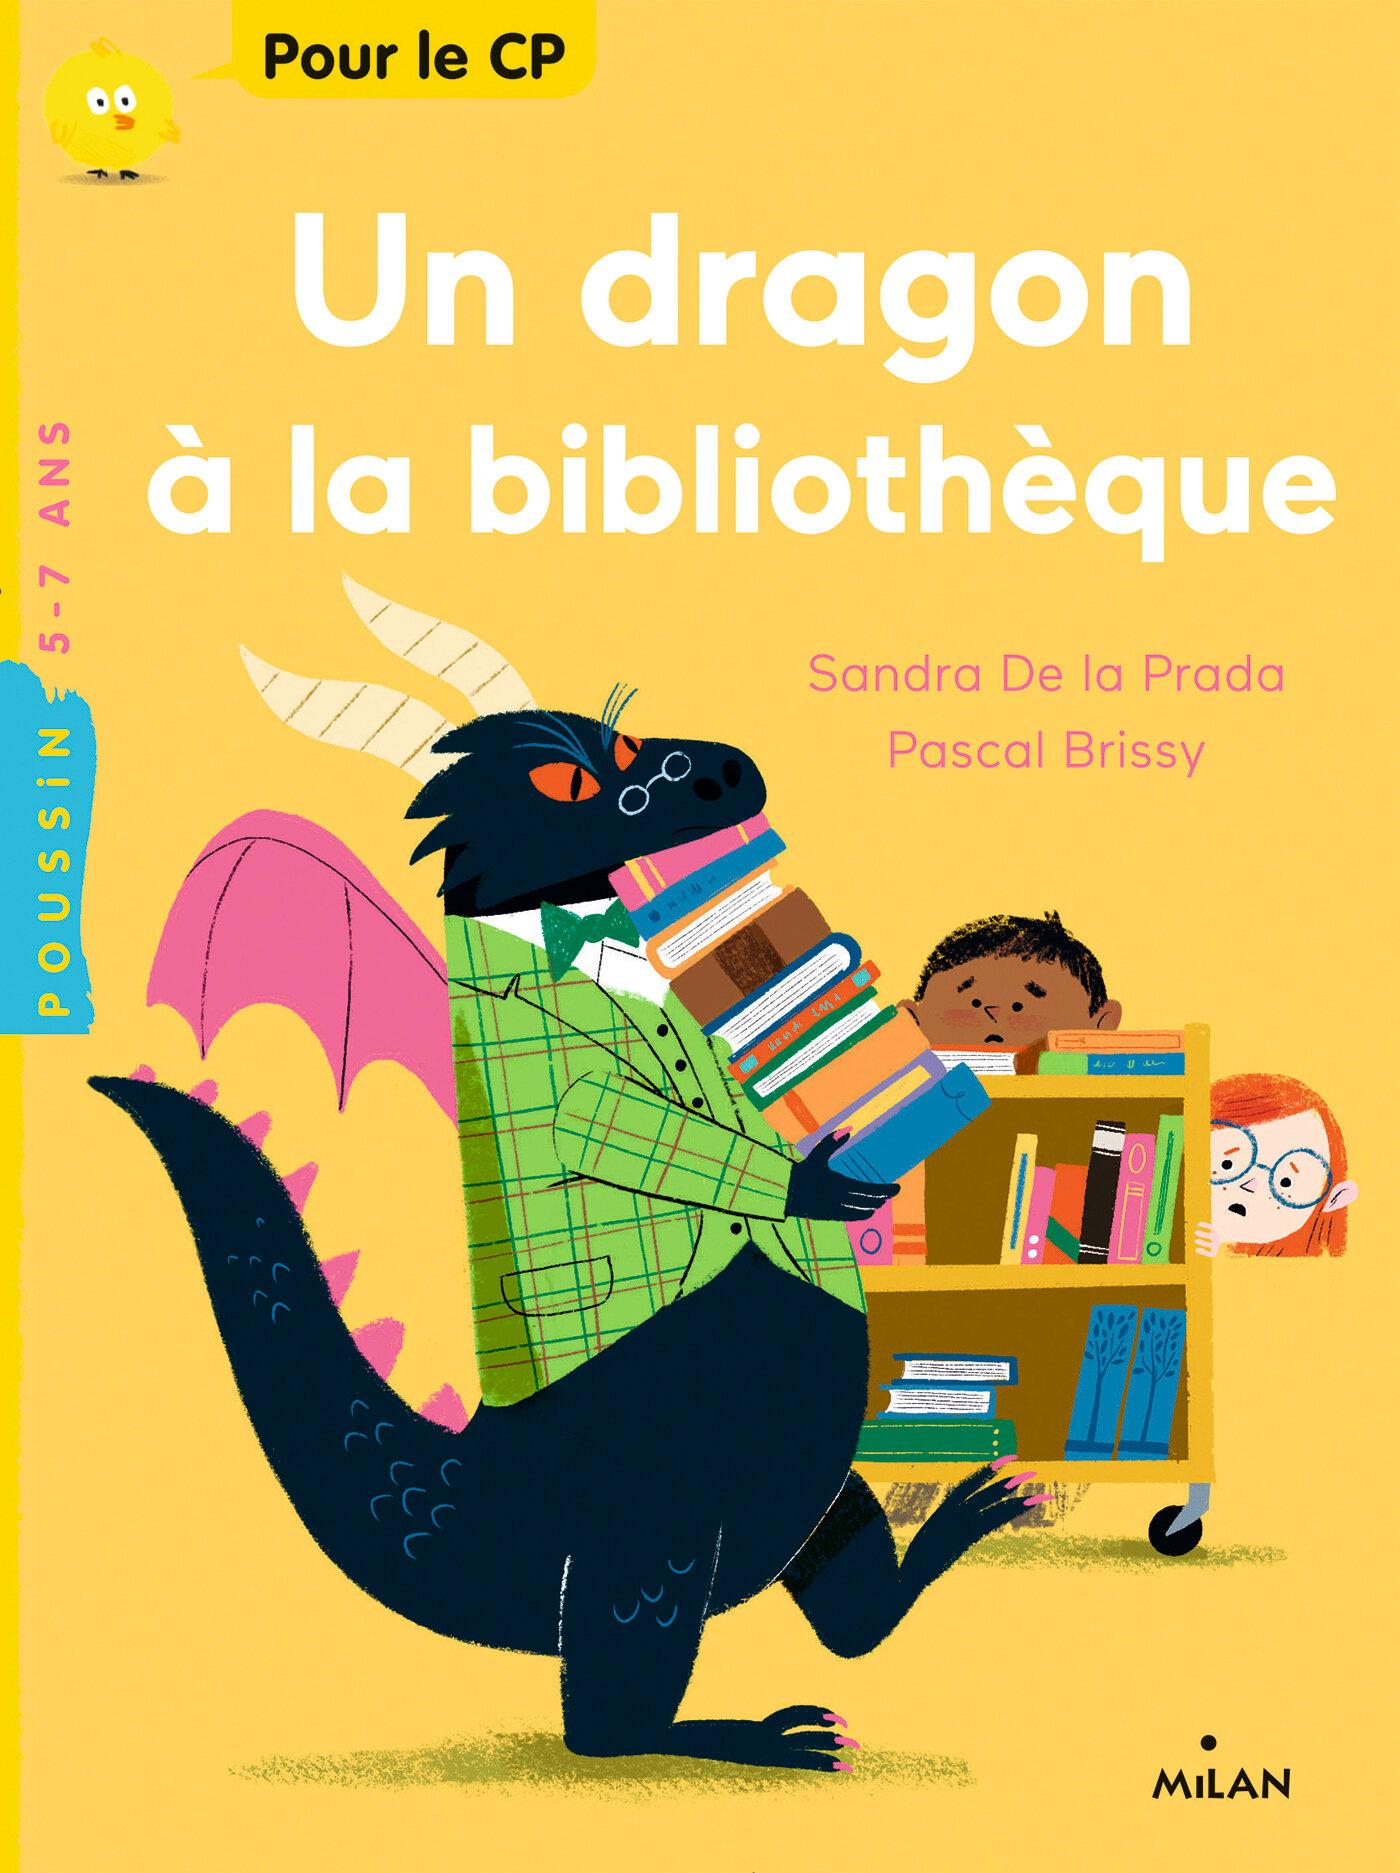 MPP Dragon bibliothèque